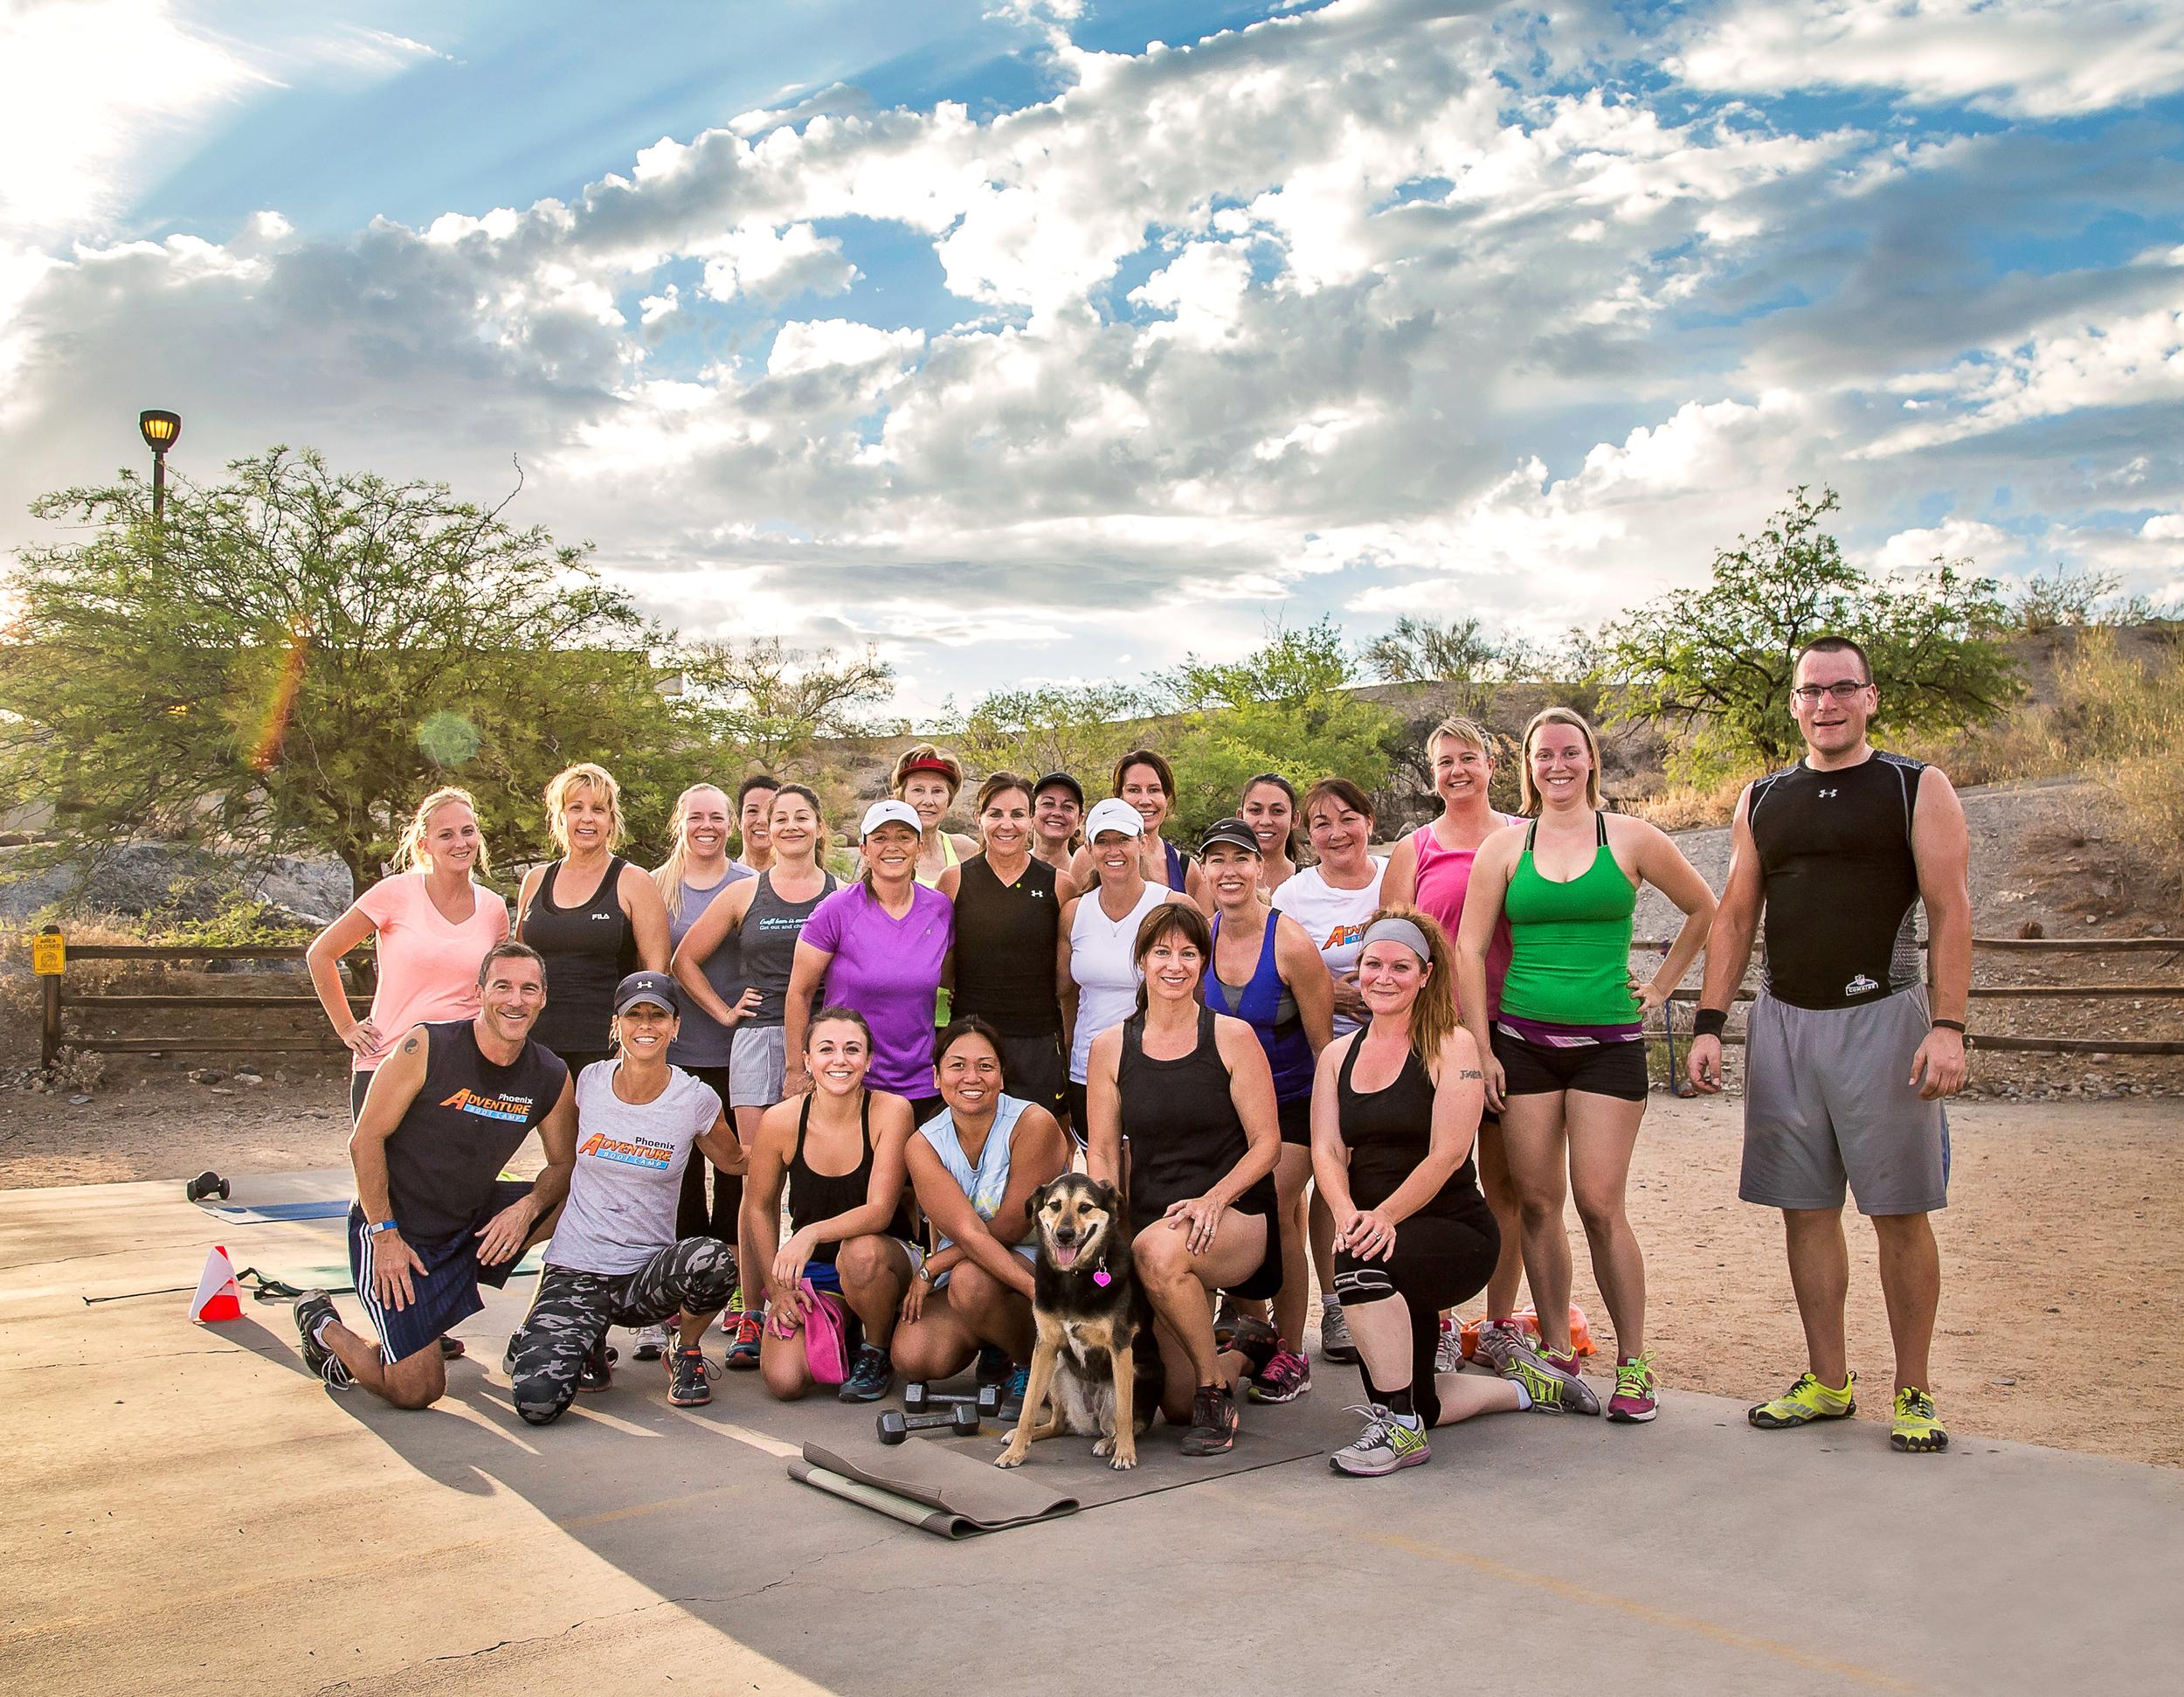 Phoenix Adventure Bootcamp Group Photo